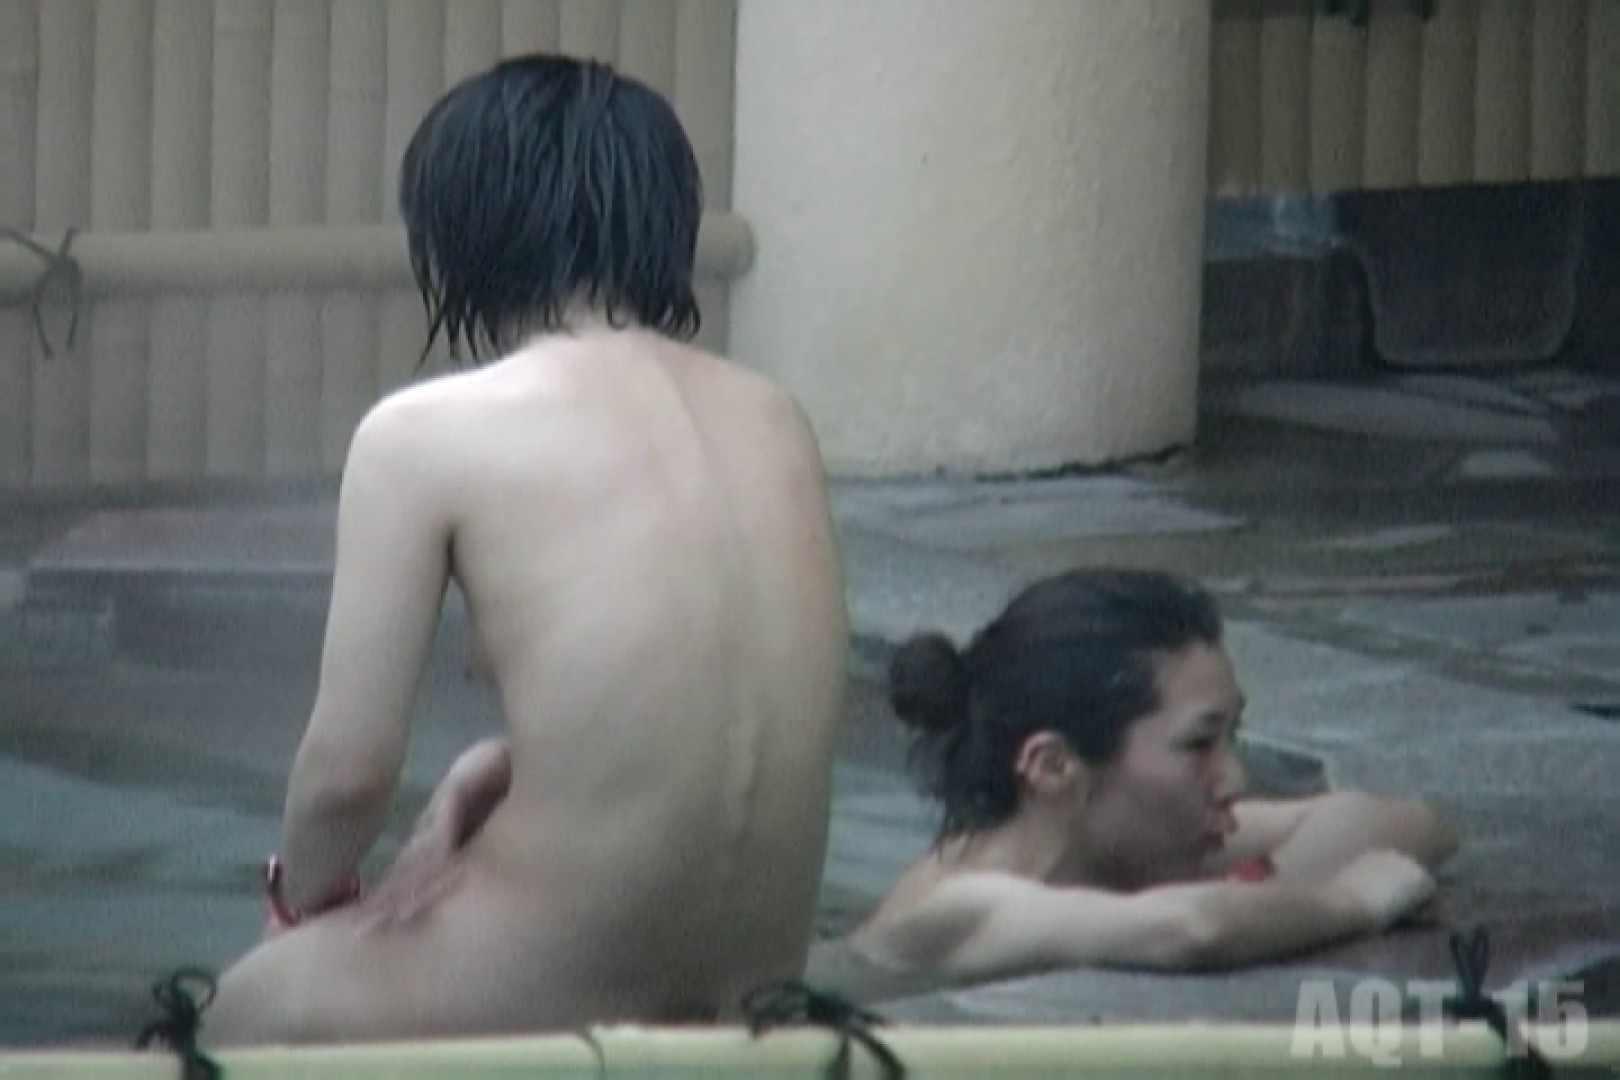 Aquaな露天風呂Vol.837 盗撮映像  107Pix 12